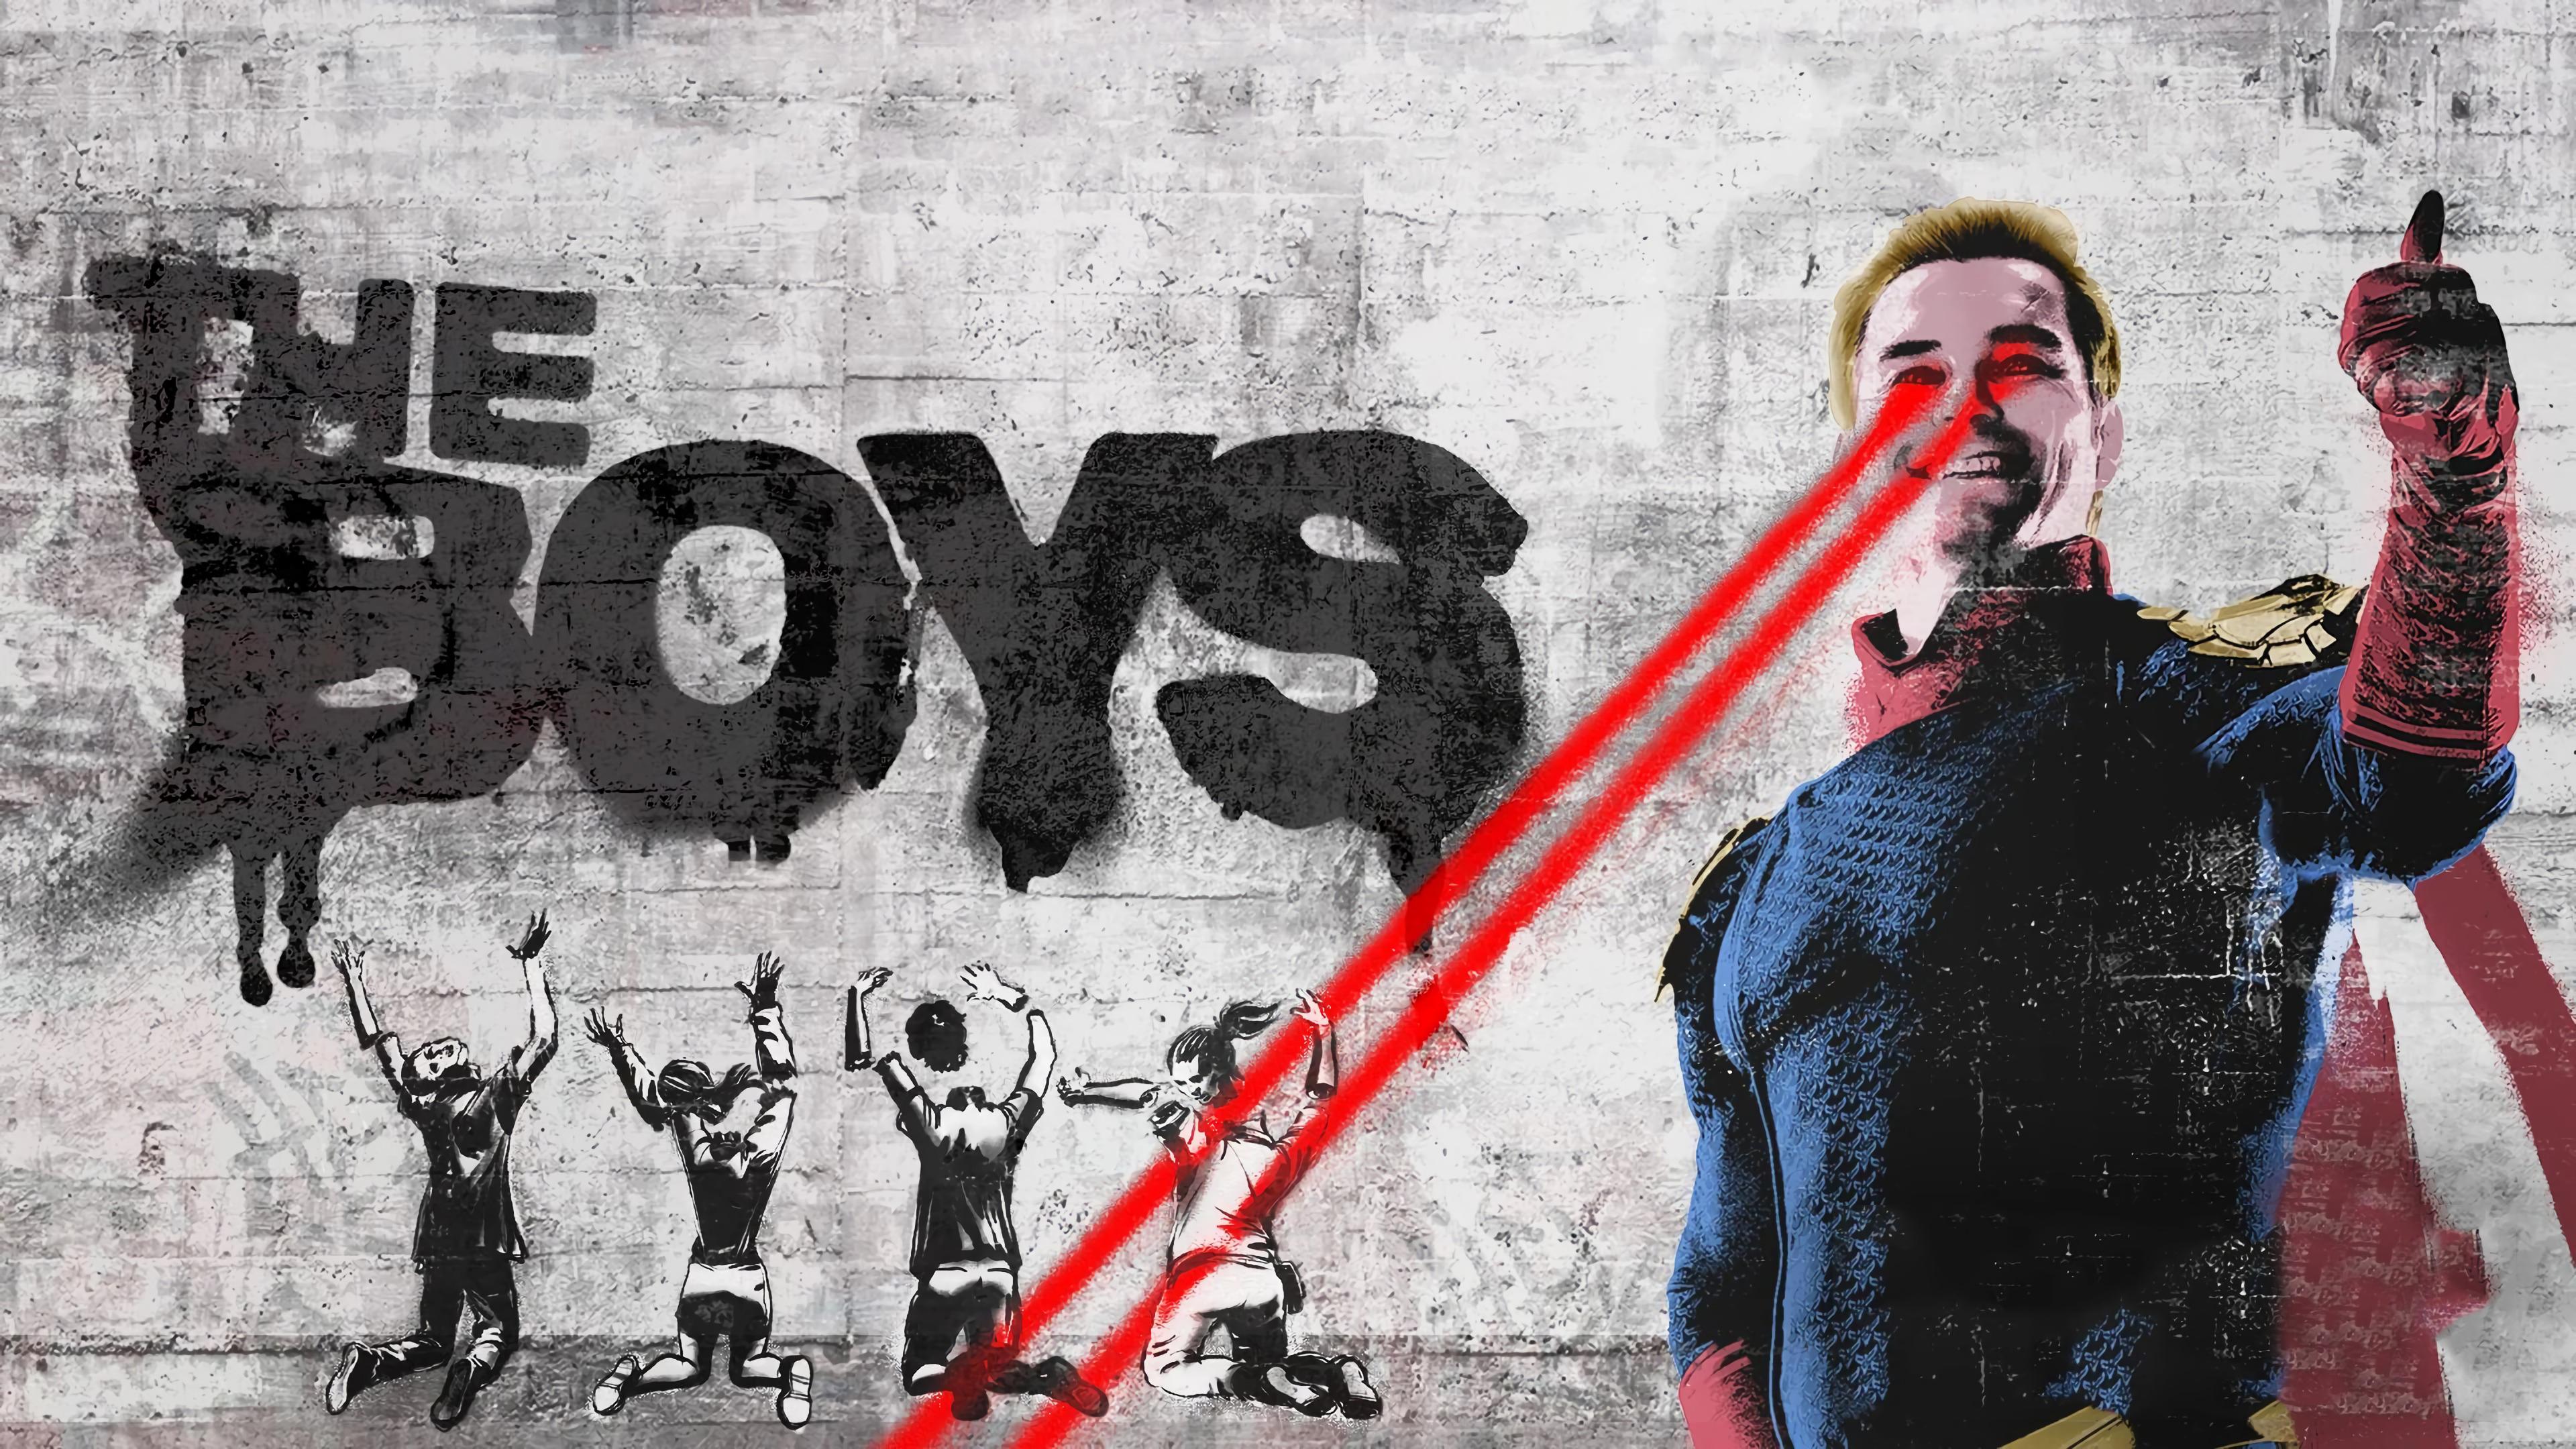 Wallpaper 4k The Boys Homelander The Boys Homelander 4k wallpaper